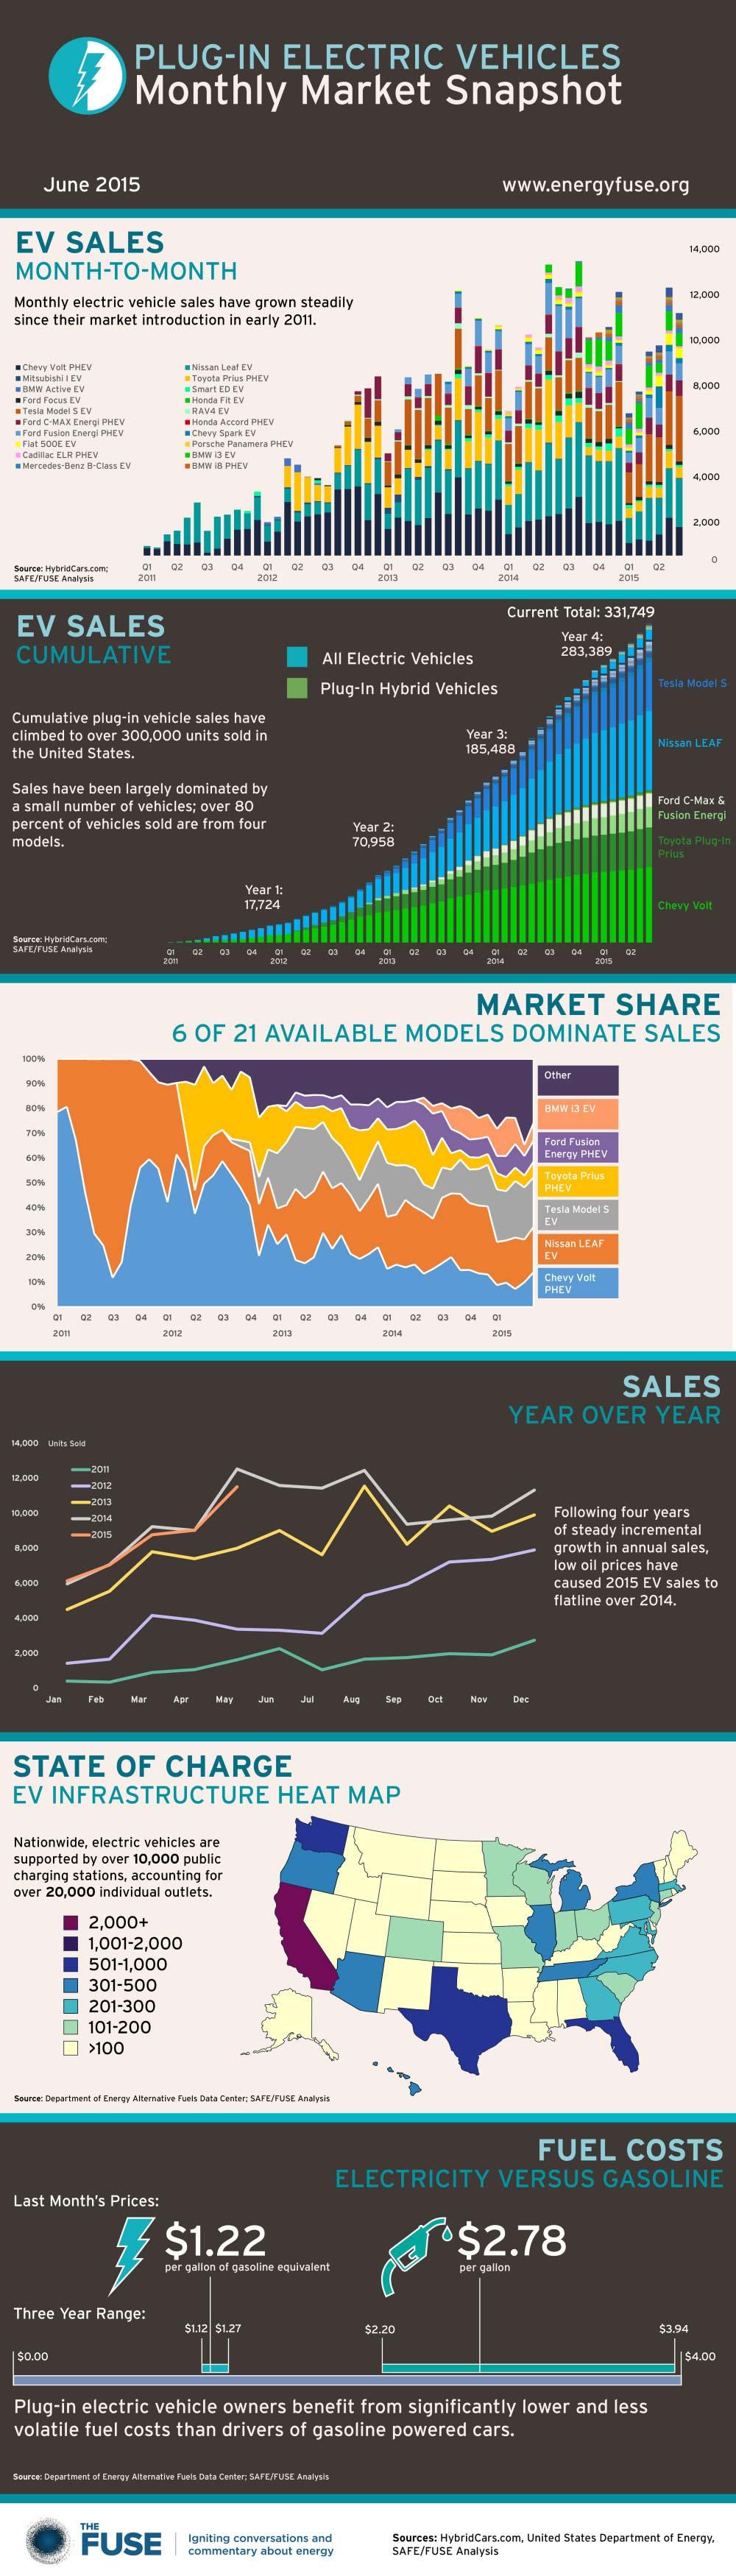 ev-sales-month-to-month